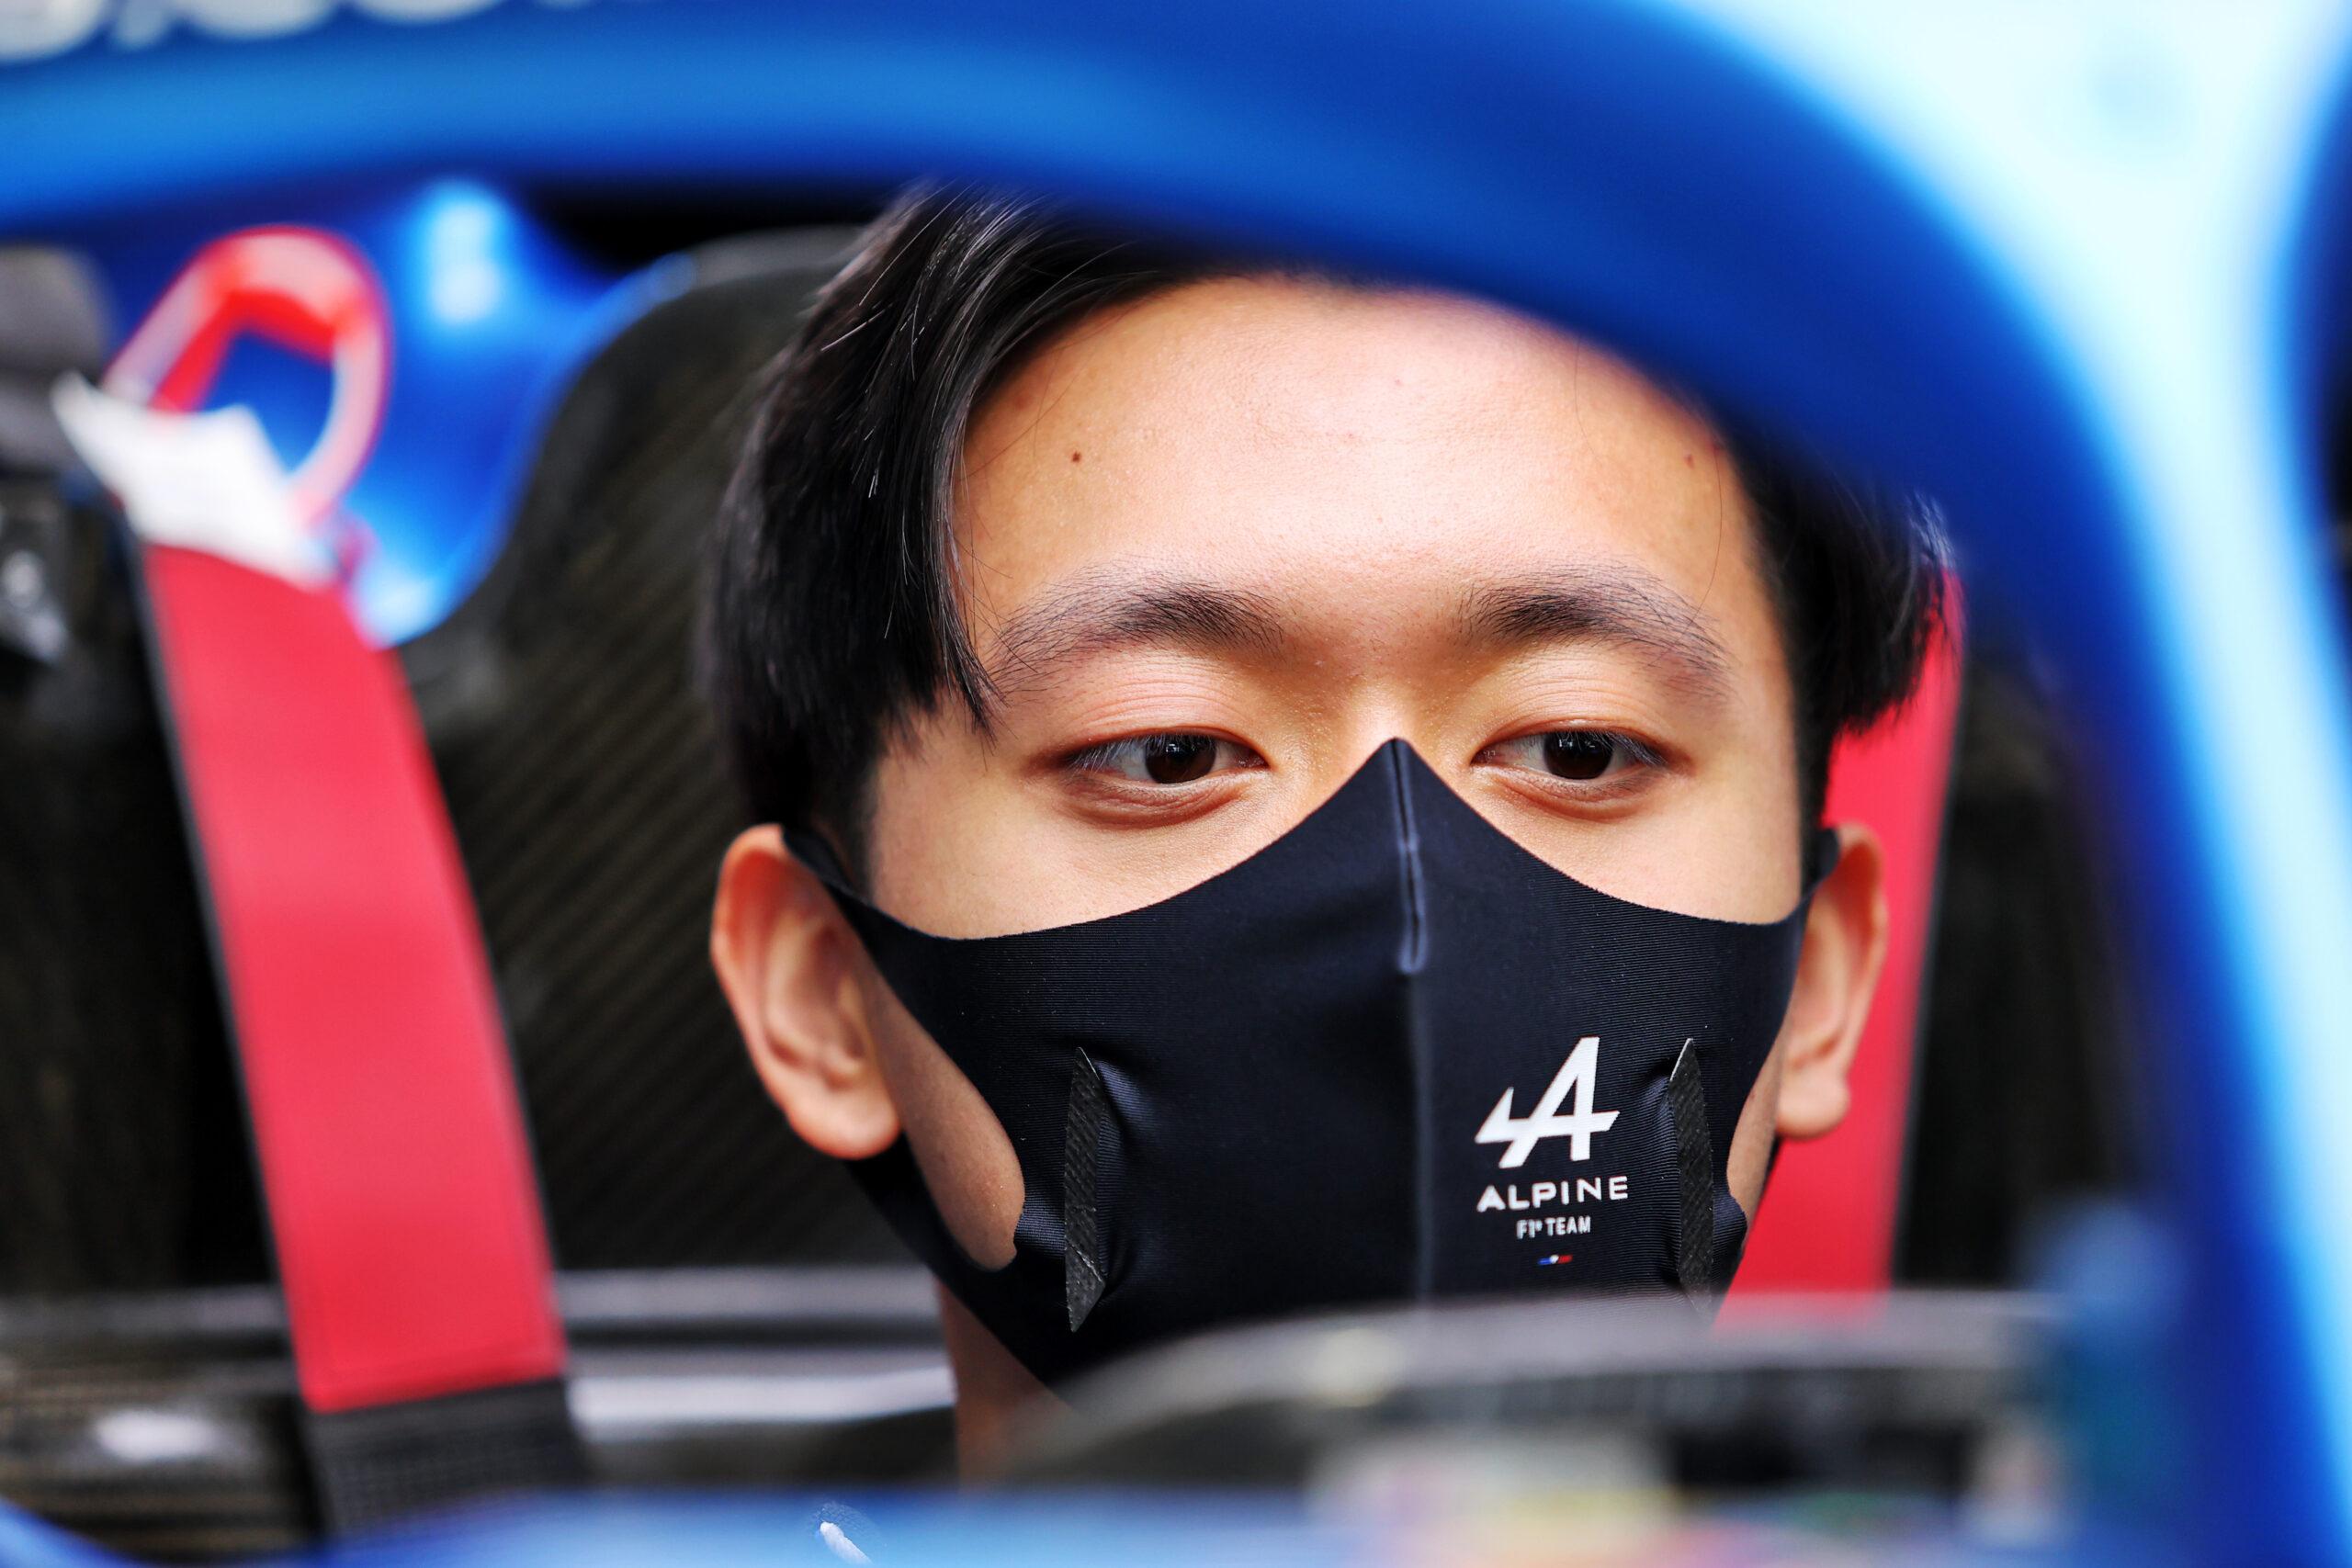 F1 - Zhou chez Alfa Romeo, Alpine ne commente pas les rumeurs